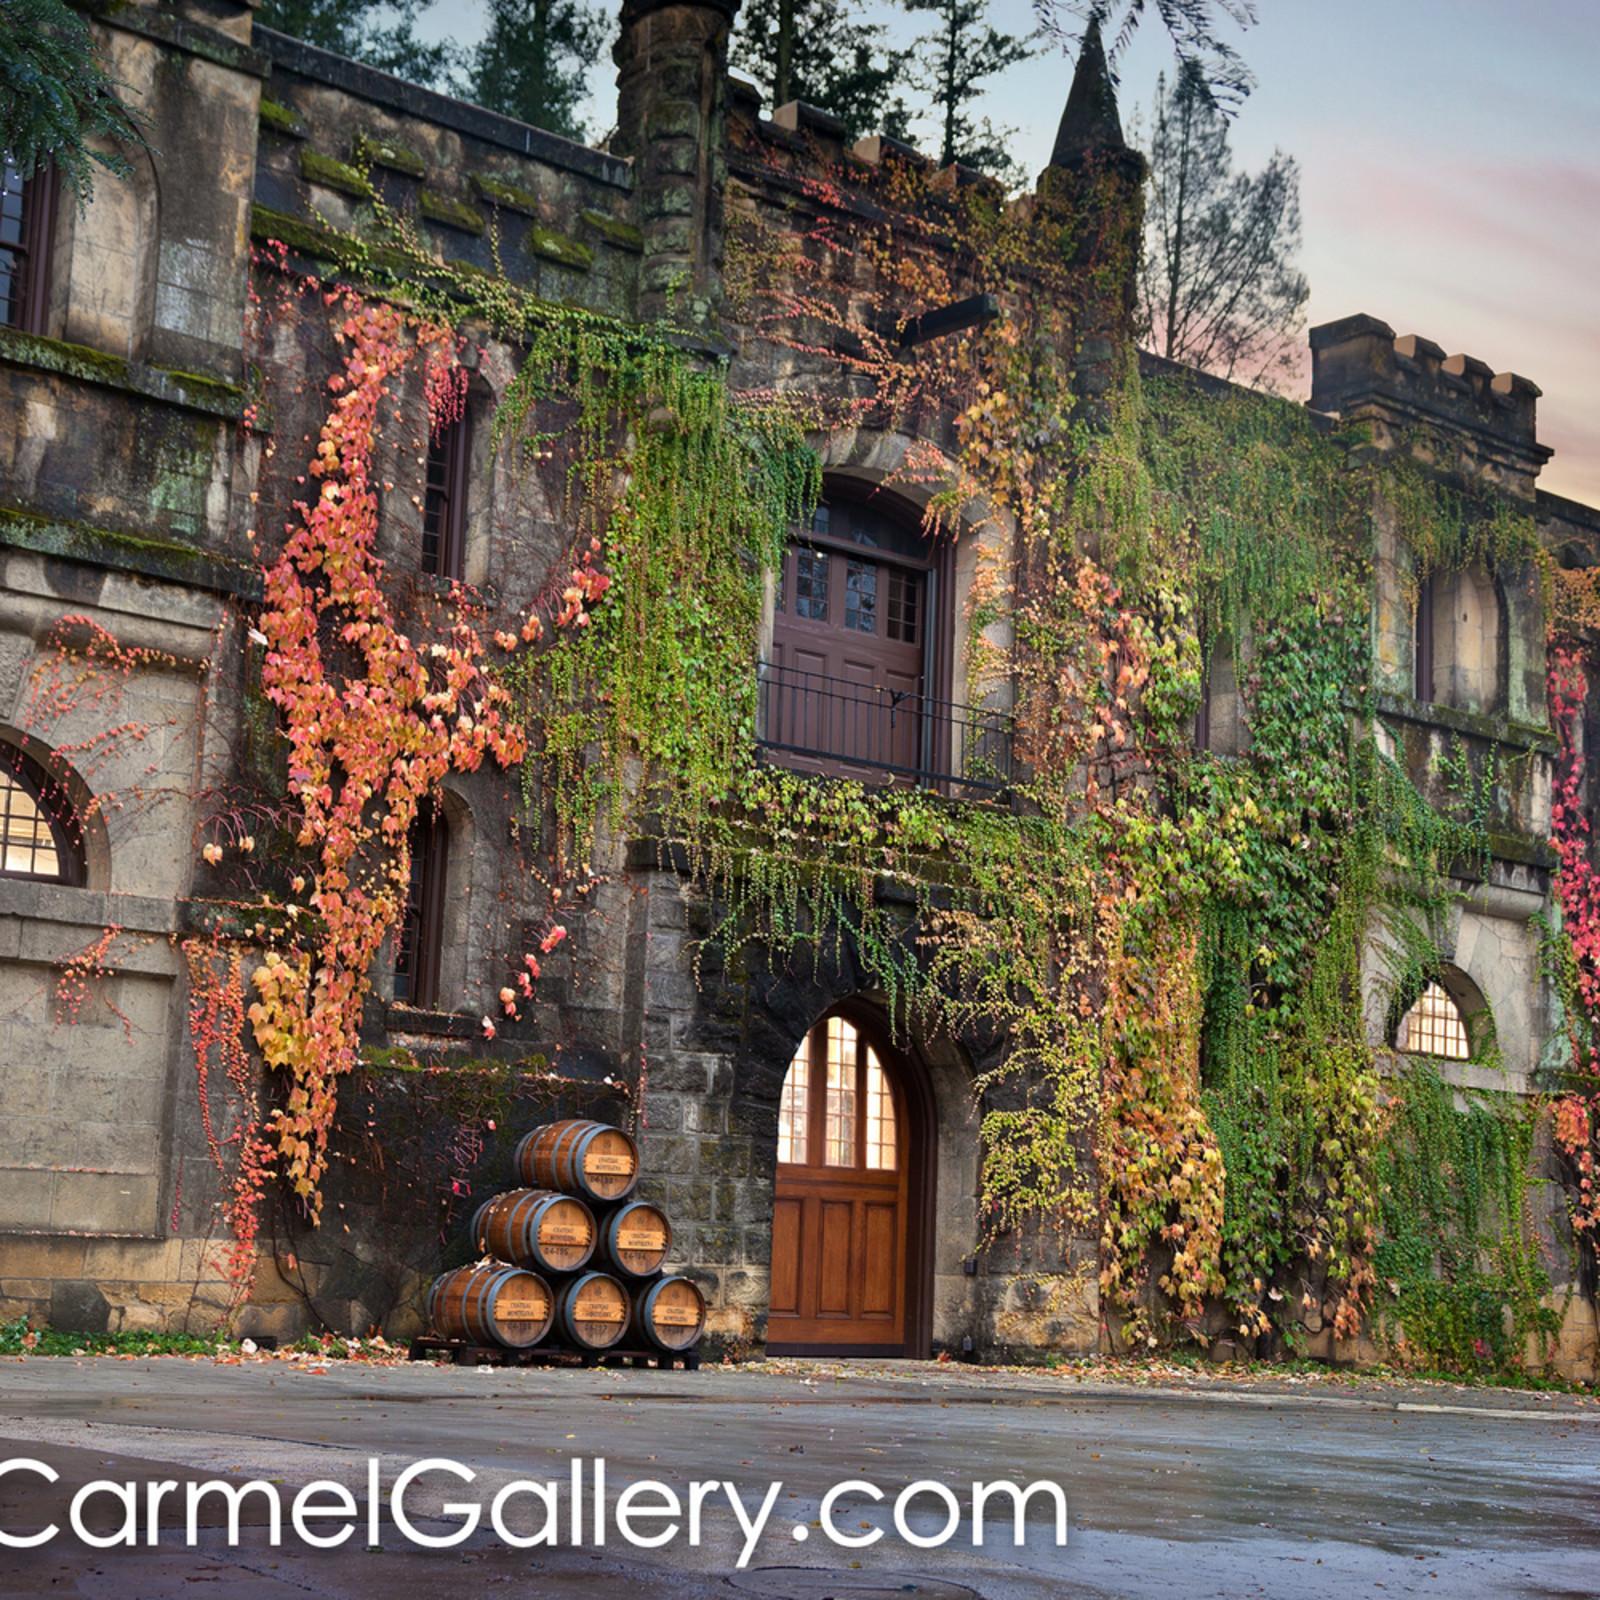 Nightfall chateau montelena oafe9a